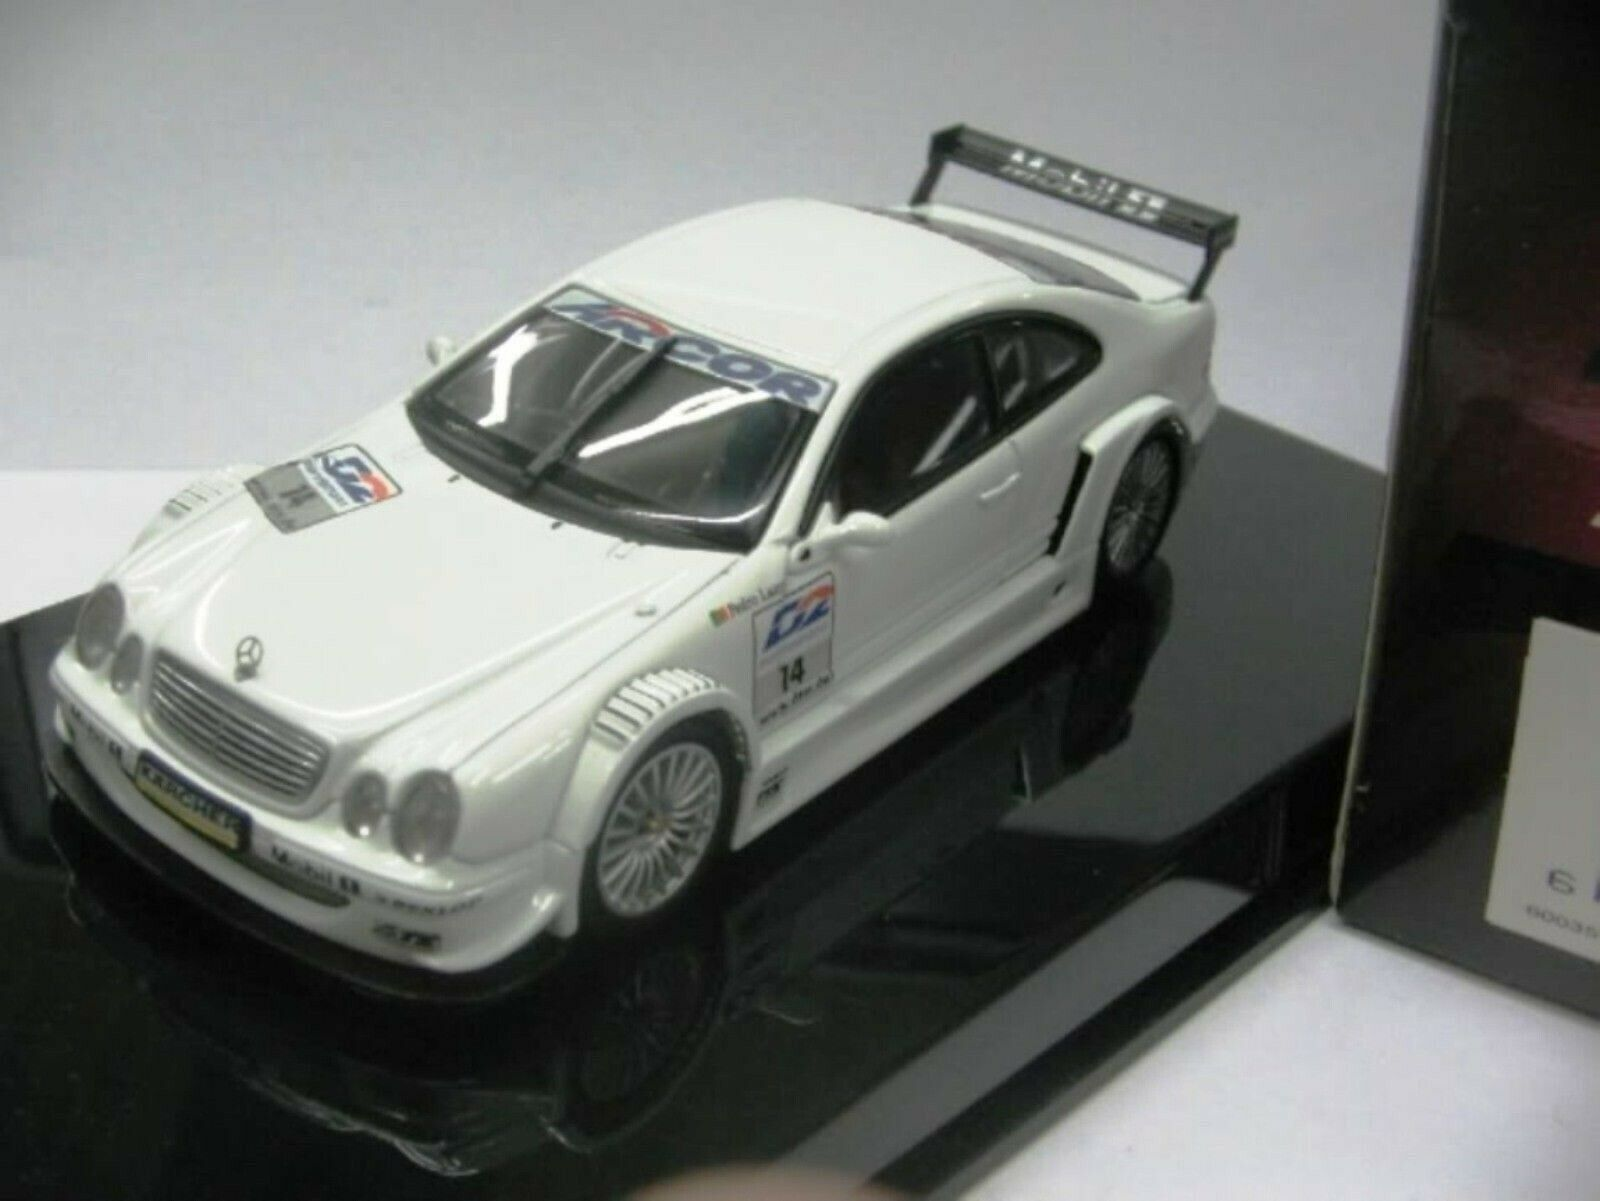 WOW EXTREMELY RARE Mercedes DTM 2000 CLK400 Lamy 1 43 Auto Art-Minichamps